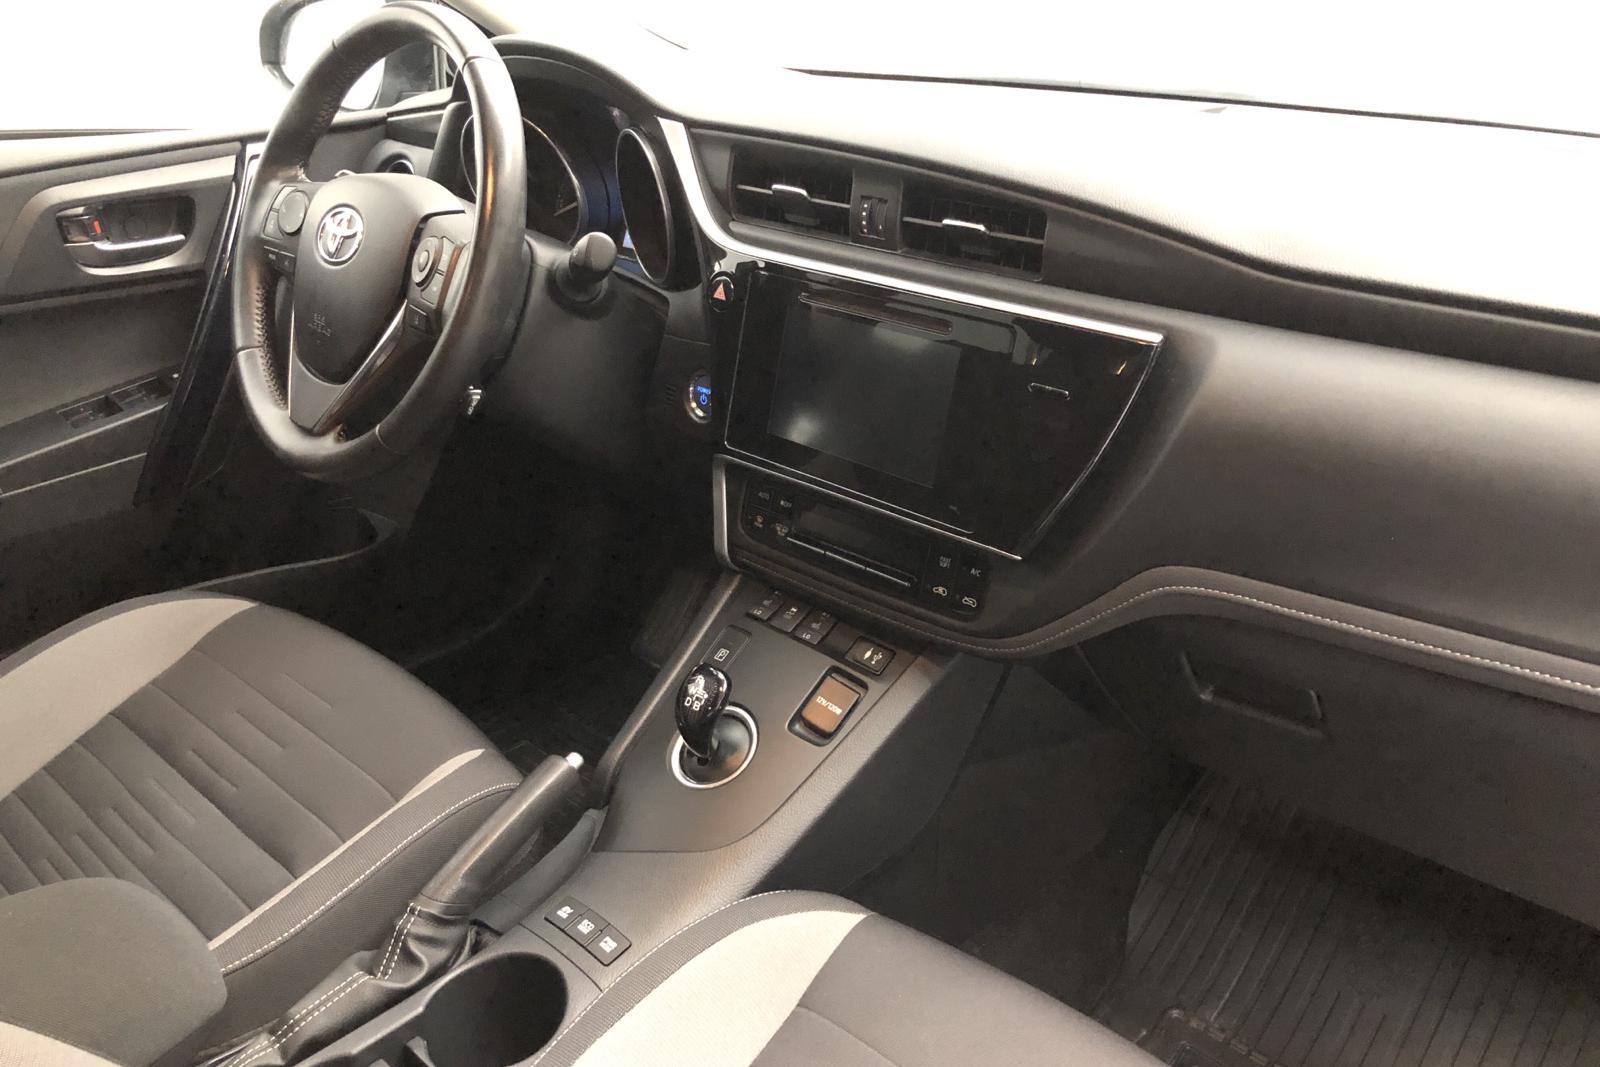 Toyota Auris 1.8 HSD Touring Sports (99hk) - 106 190 km - Automatic - Dark Grey - 2016